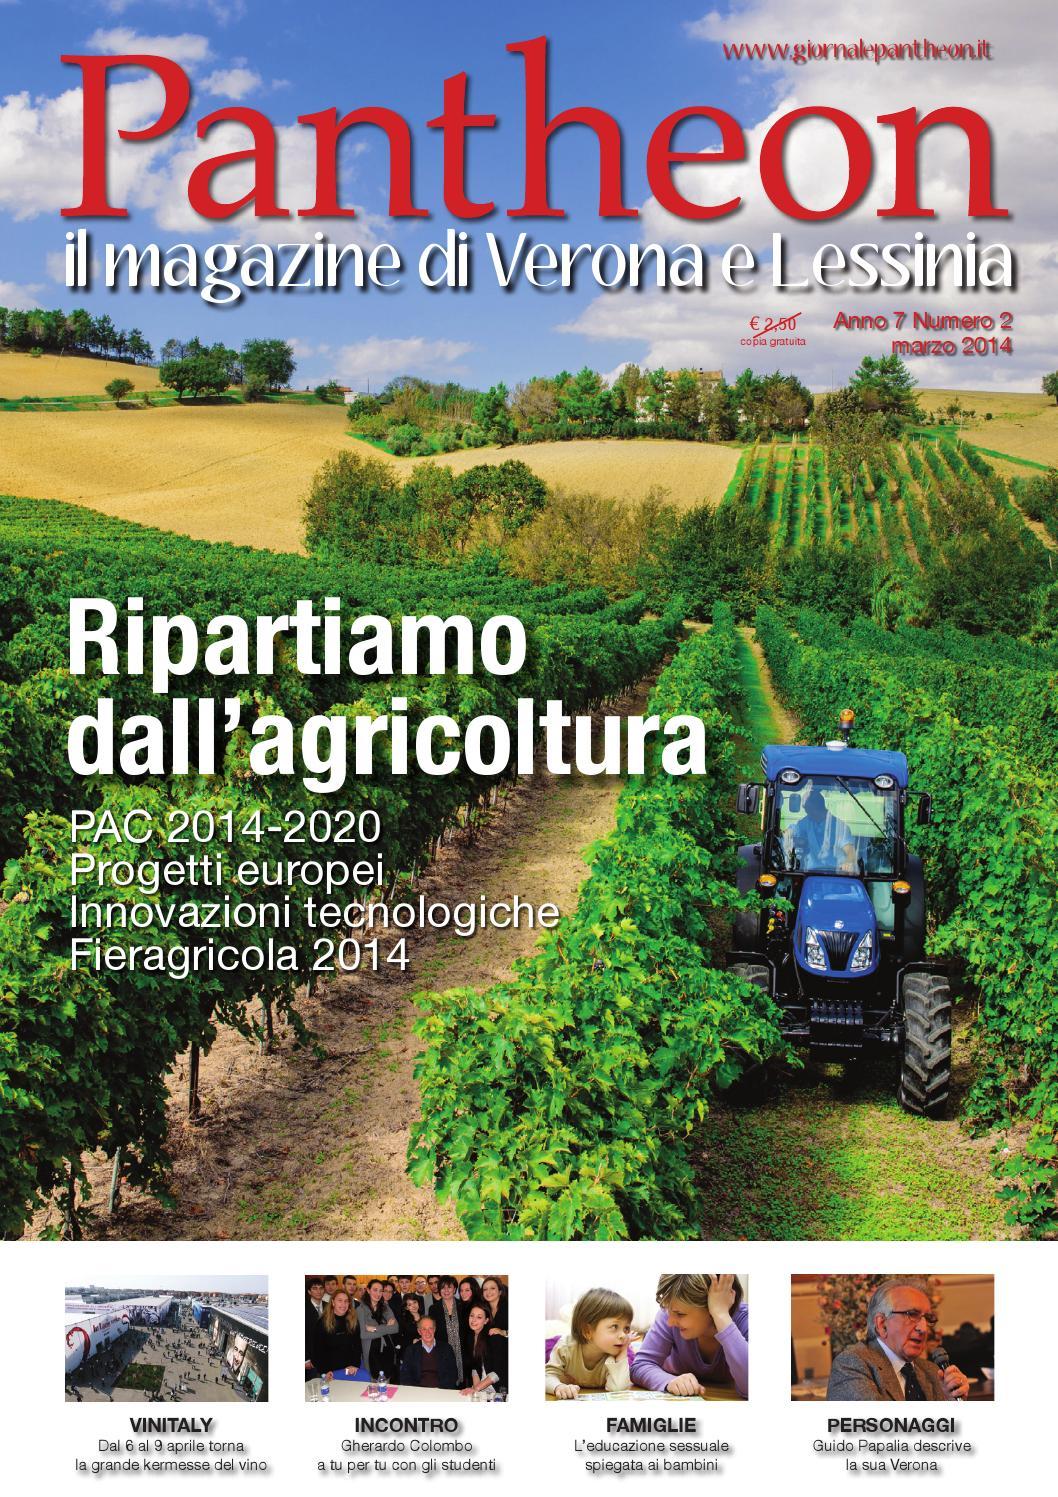 Pantheon 48 - Ripartiamo dall agricoltura by Pantheon Verona Network - issuu 650ff051344